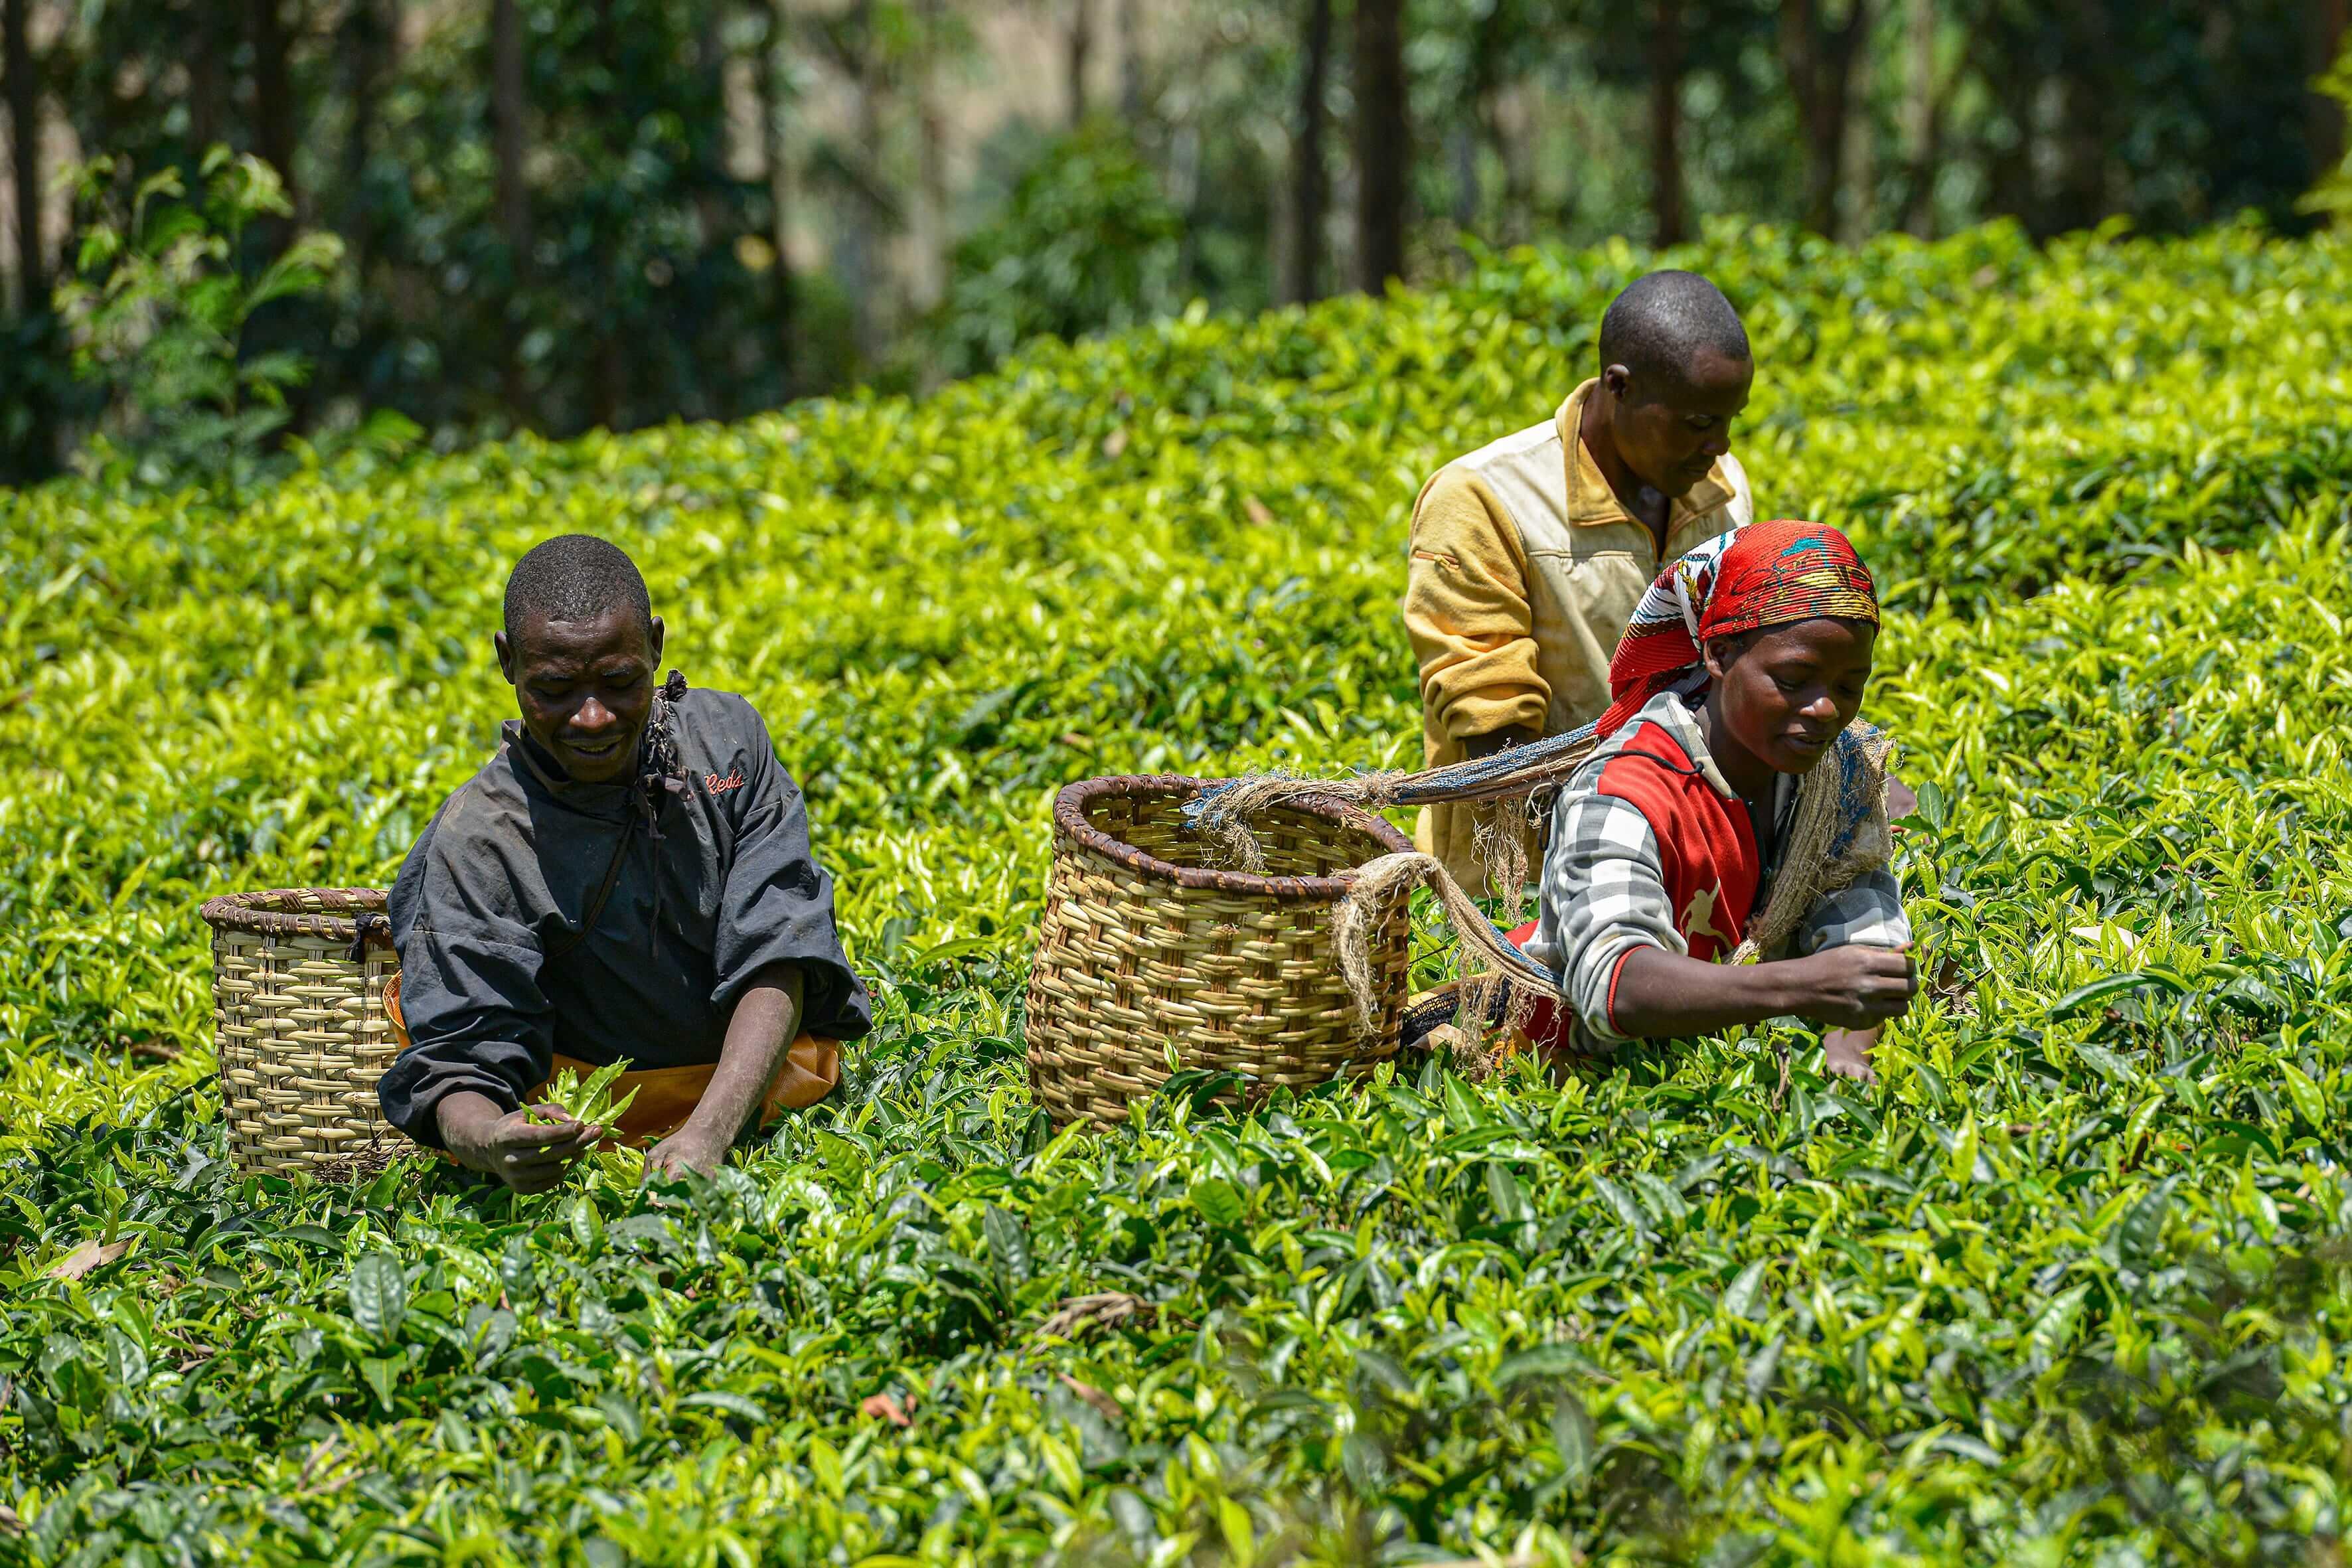 A group of tea pickers at work in a tea plantation in Gicumbi, Rwanda (Photo: Shutterstock)